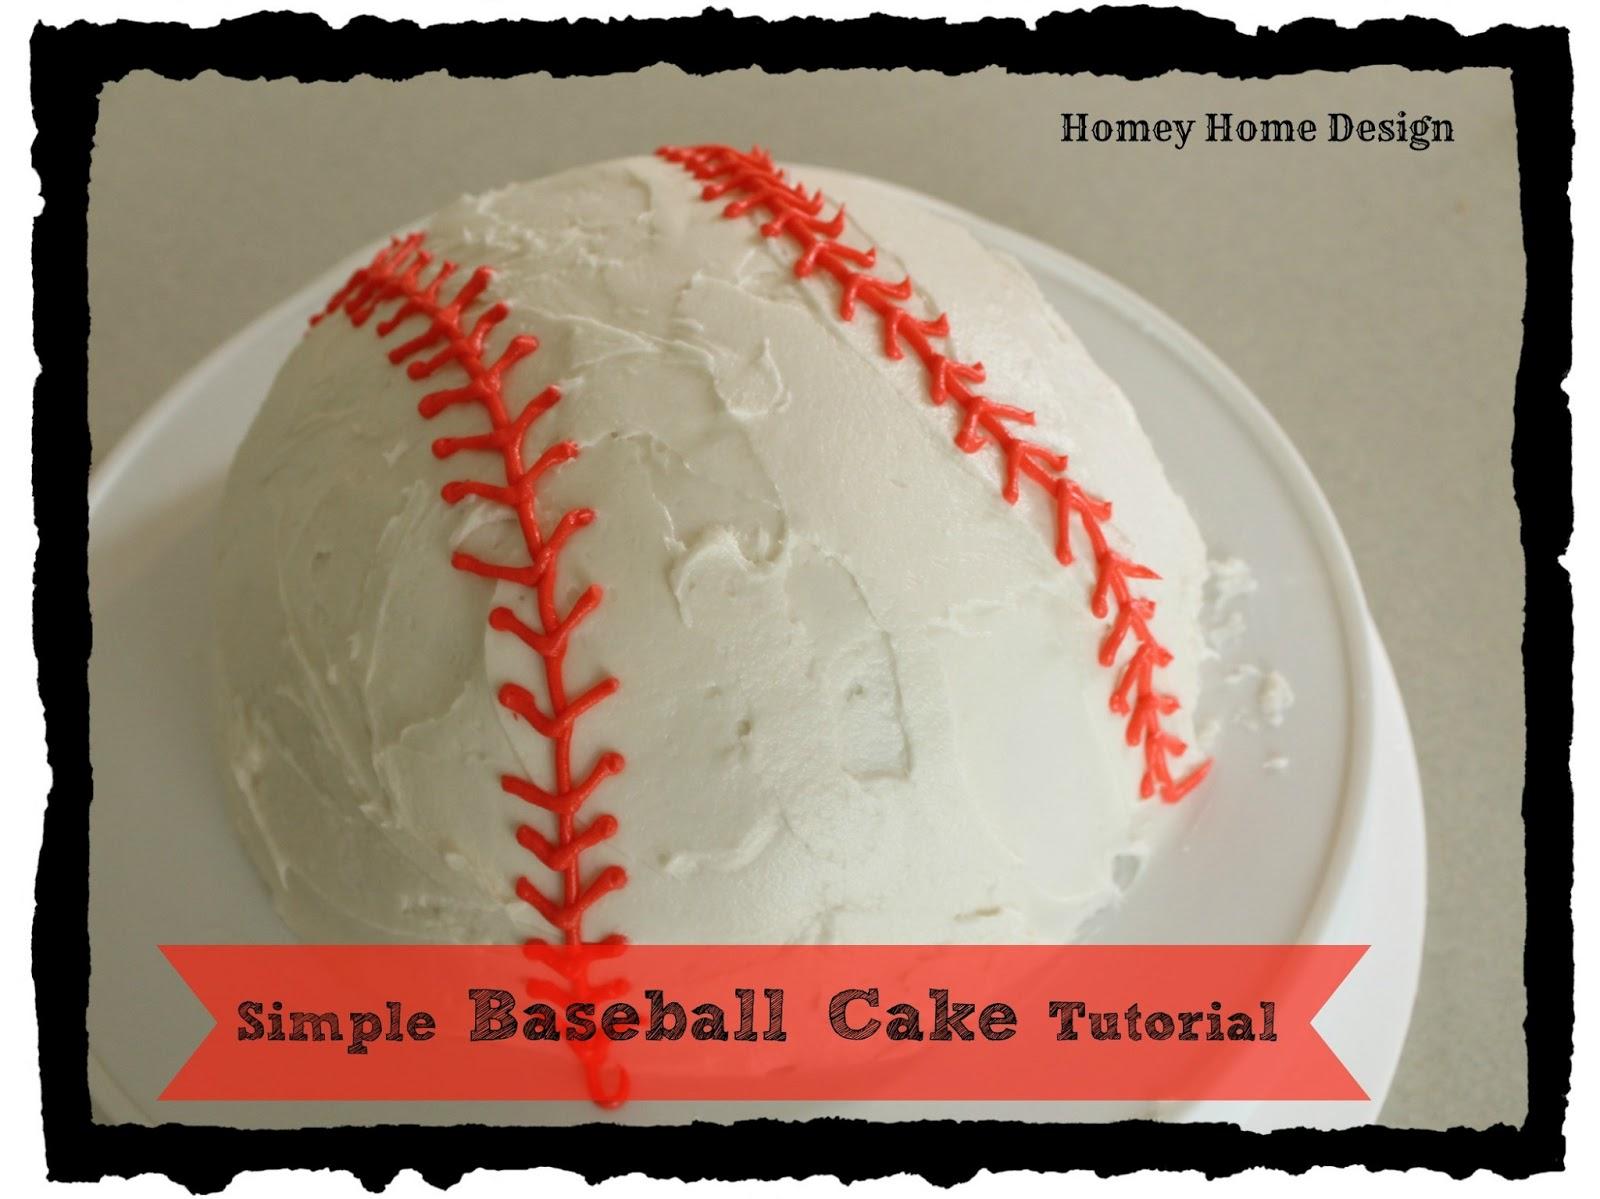 homey home design Simple Baseball Cake